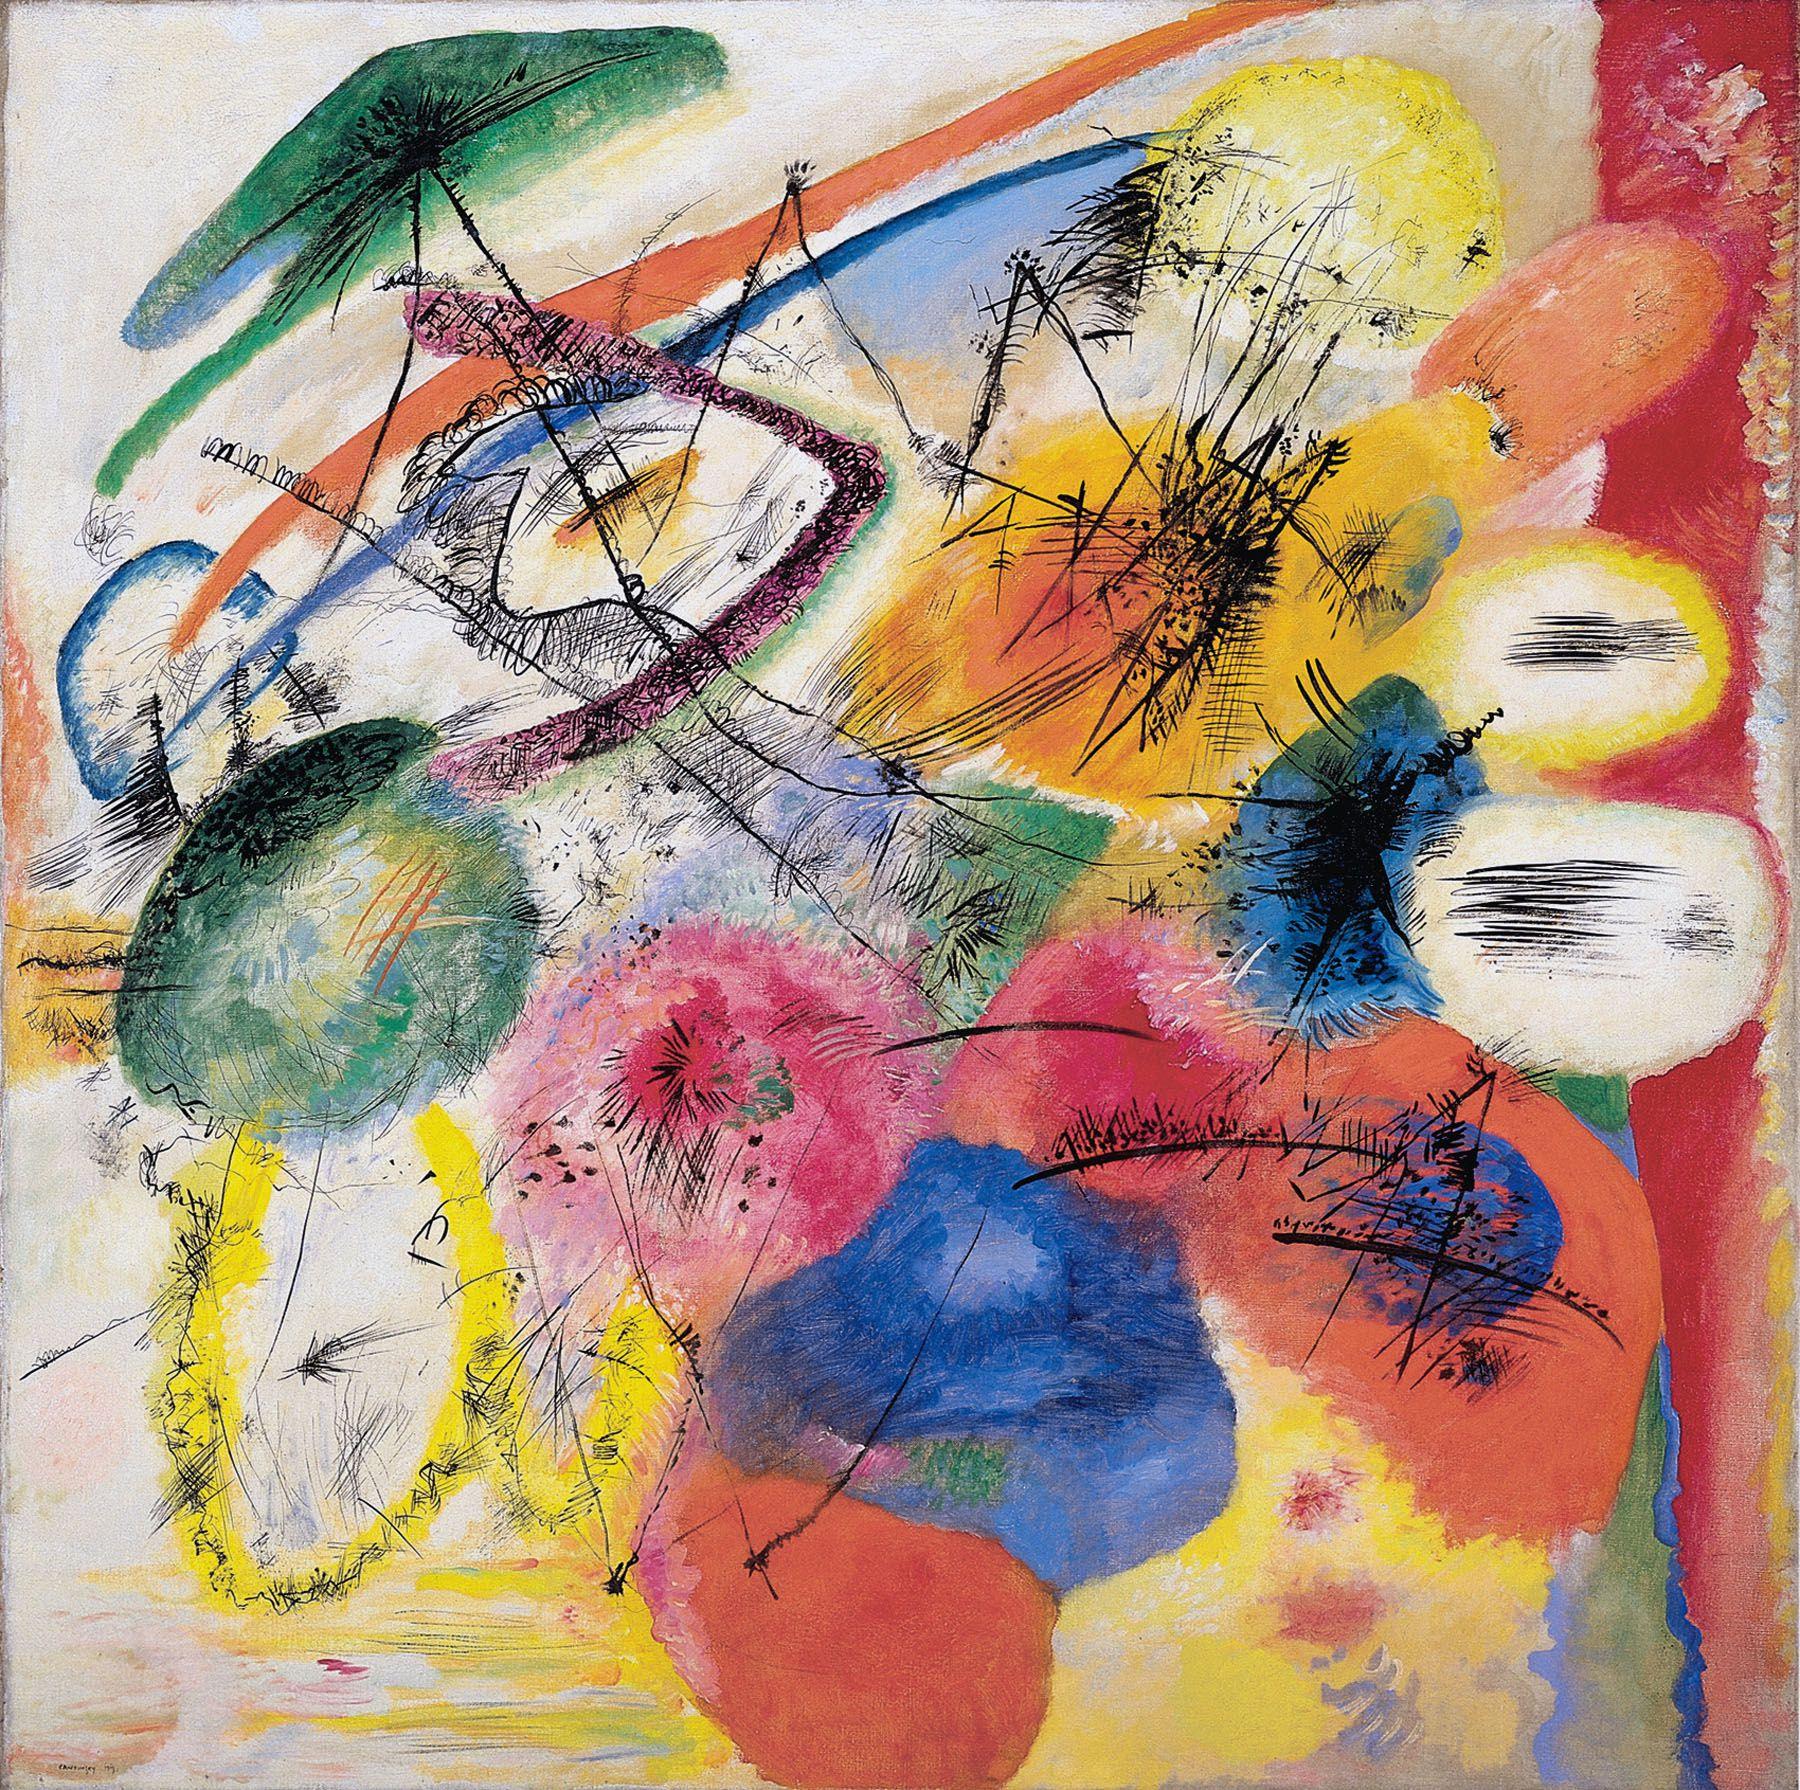 Wassily Kandinsky (Russian, 1866-1944) Wassily Kandinsky (Russian, 1866-1944). Black Lines (Schwarze Striche), December 1913. Oil on canvas. 51 x 51 5/8 in. (129.4 x 131.1 cm). Solomon R. Guggenheim Founding Collection, By gift 37.241. Solomon R. Guggenheim Museum, New York.